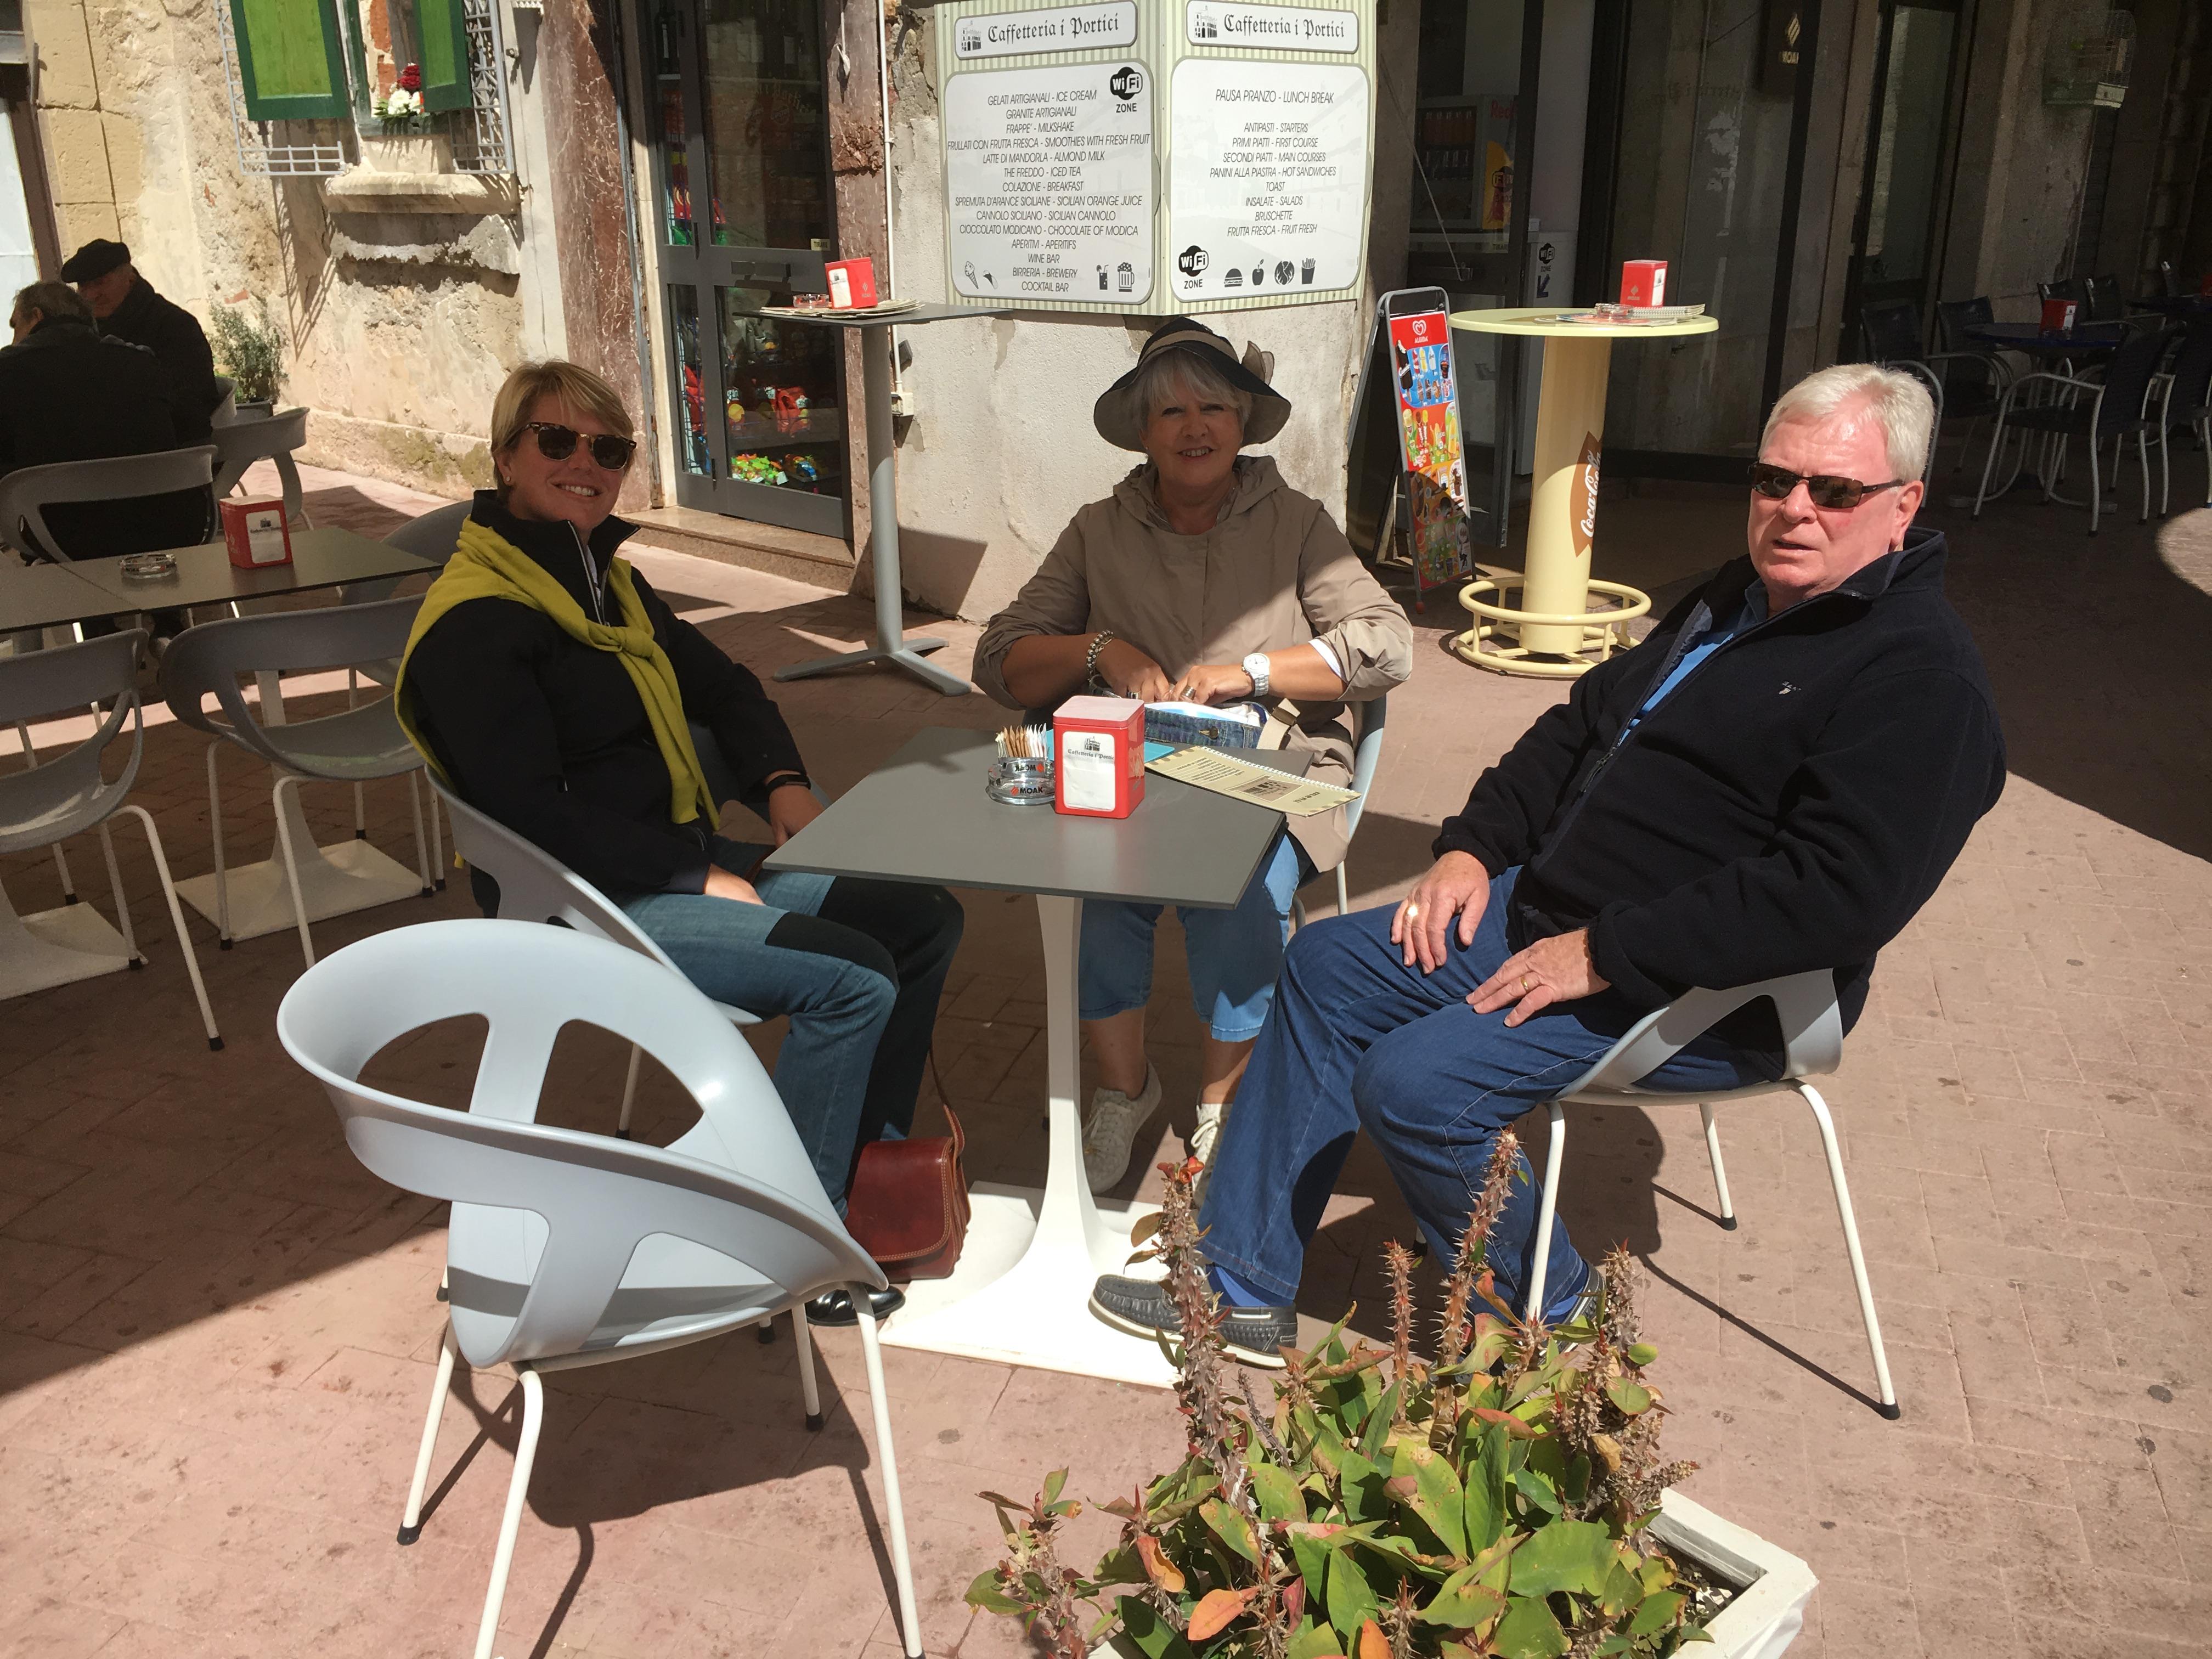 Tea with David and Lauri